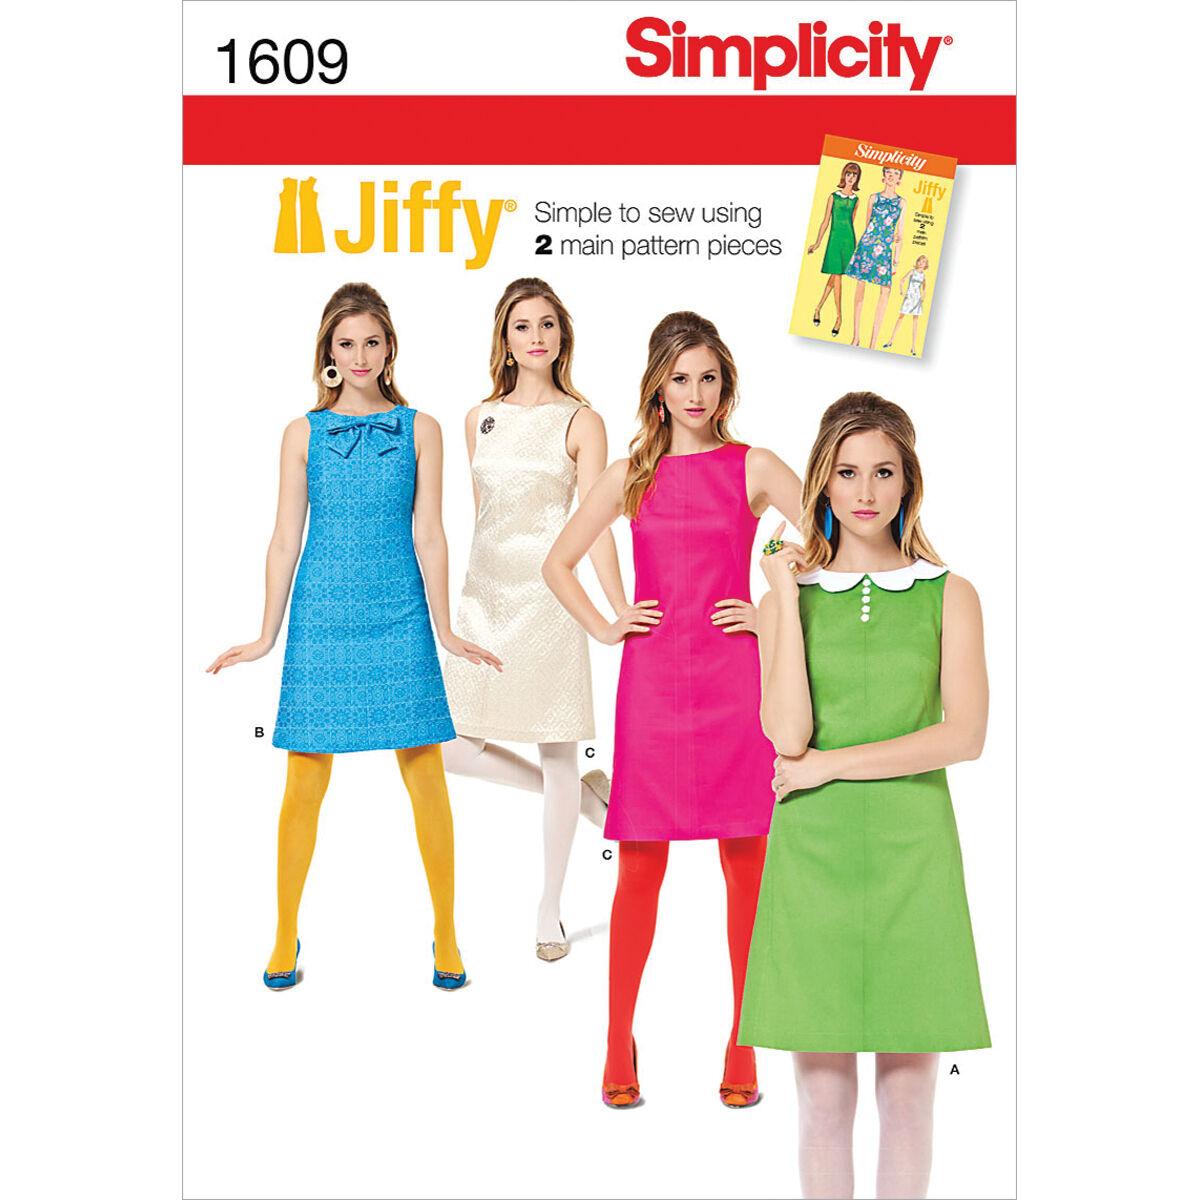 1960s – 70s Sewing Patterns- Dresses, Tops, Pants, Mens Simplicity Pattern 1609H5 6 - 8 - 10 - 12 - - Simplicity Misses Dr $10.77 AT vintagedancer.com